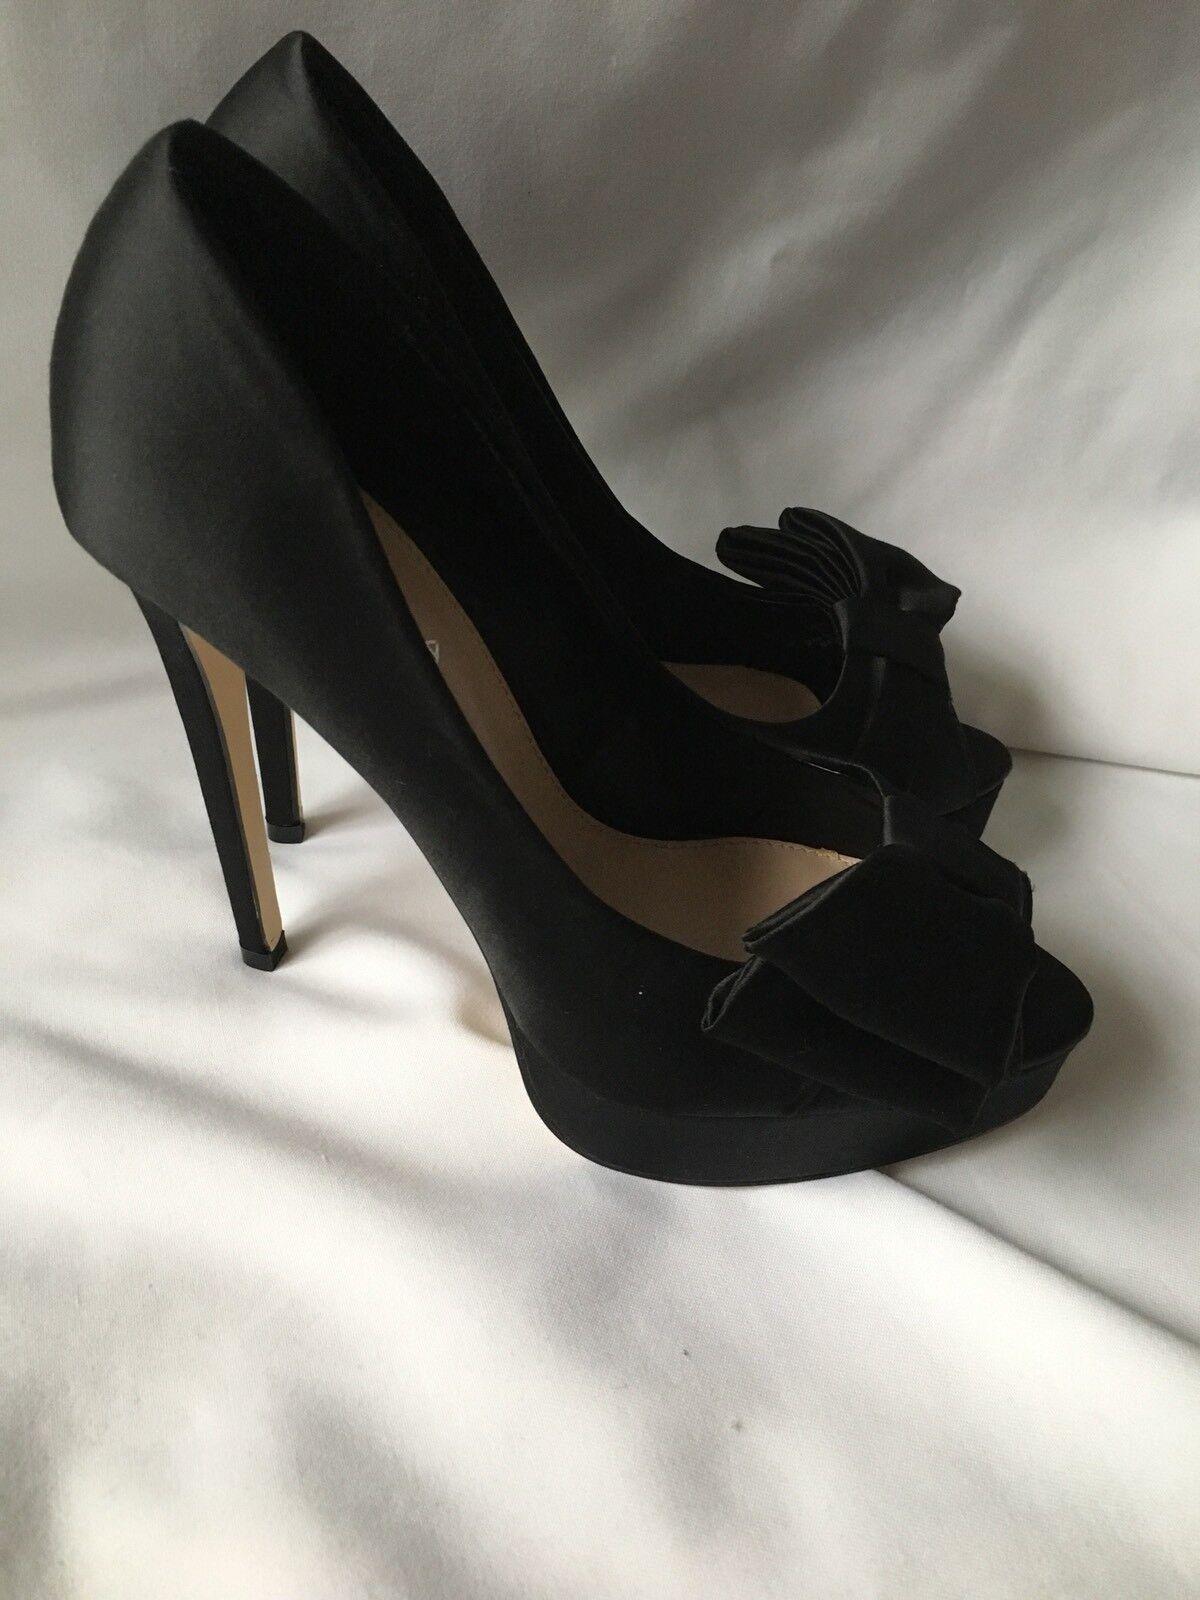 Carvela Kiara Black Satin Heels shoes Size 38 (5) New With Box